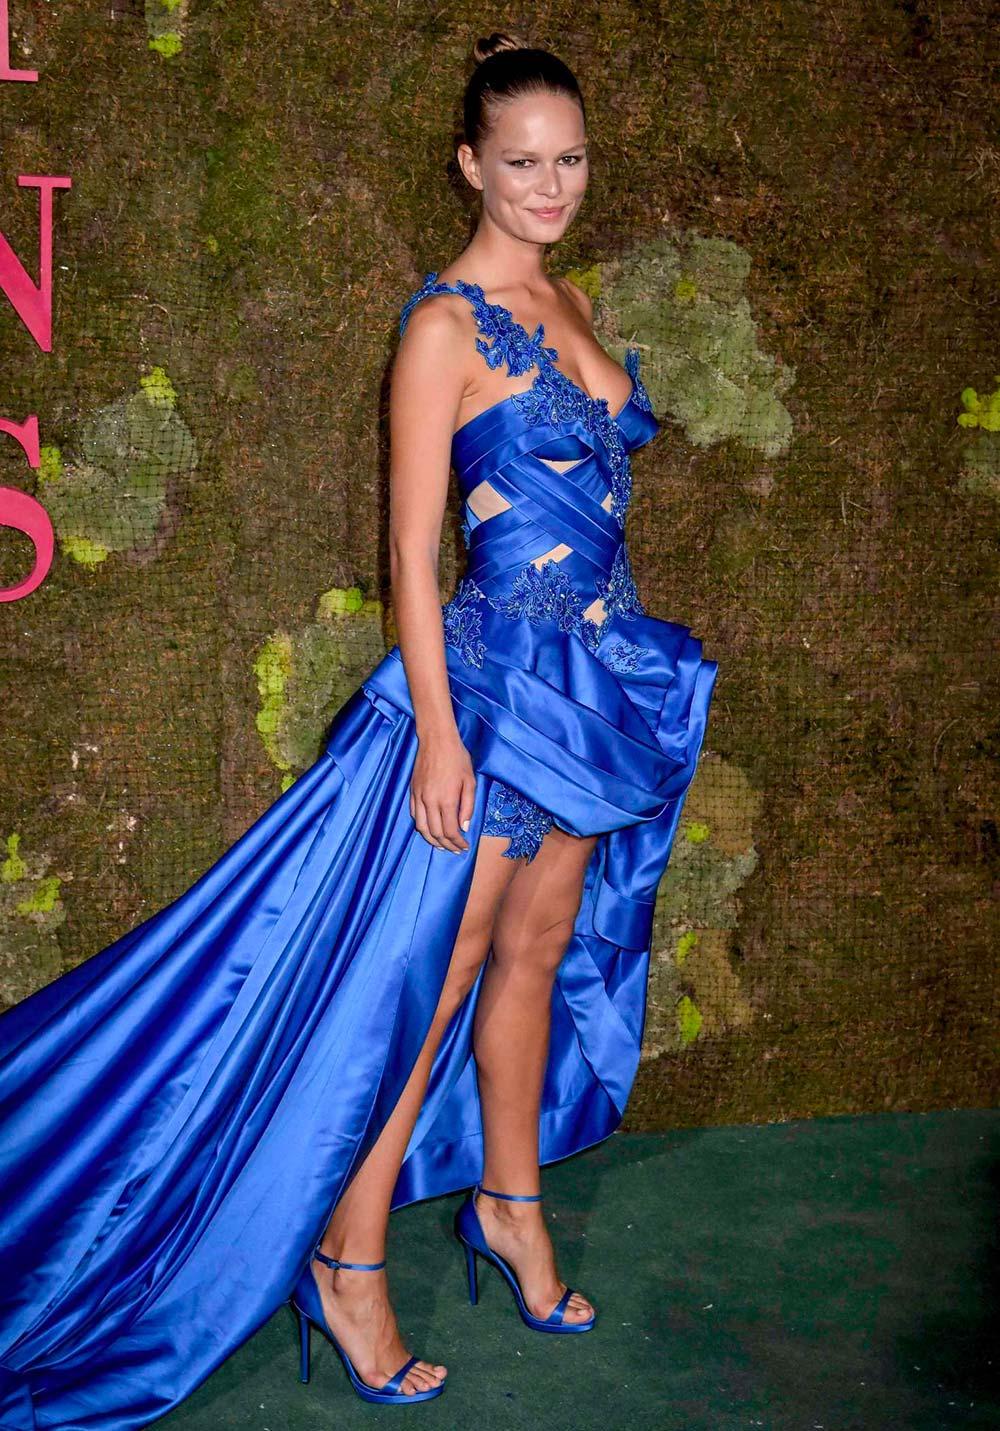 Green Carpet Fashion Awards 2018 - Anna Ewers - Hair & Makeup Massimo Serini Team